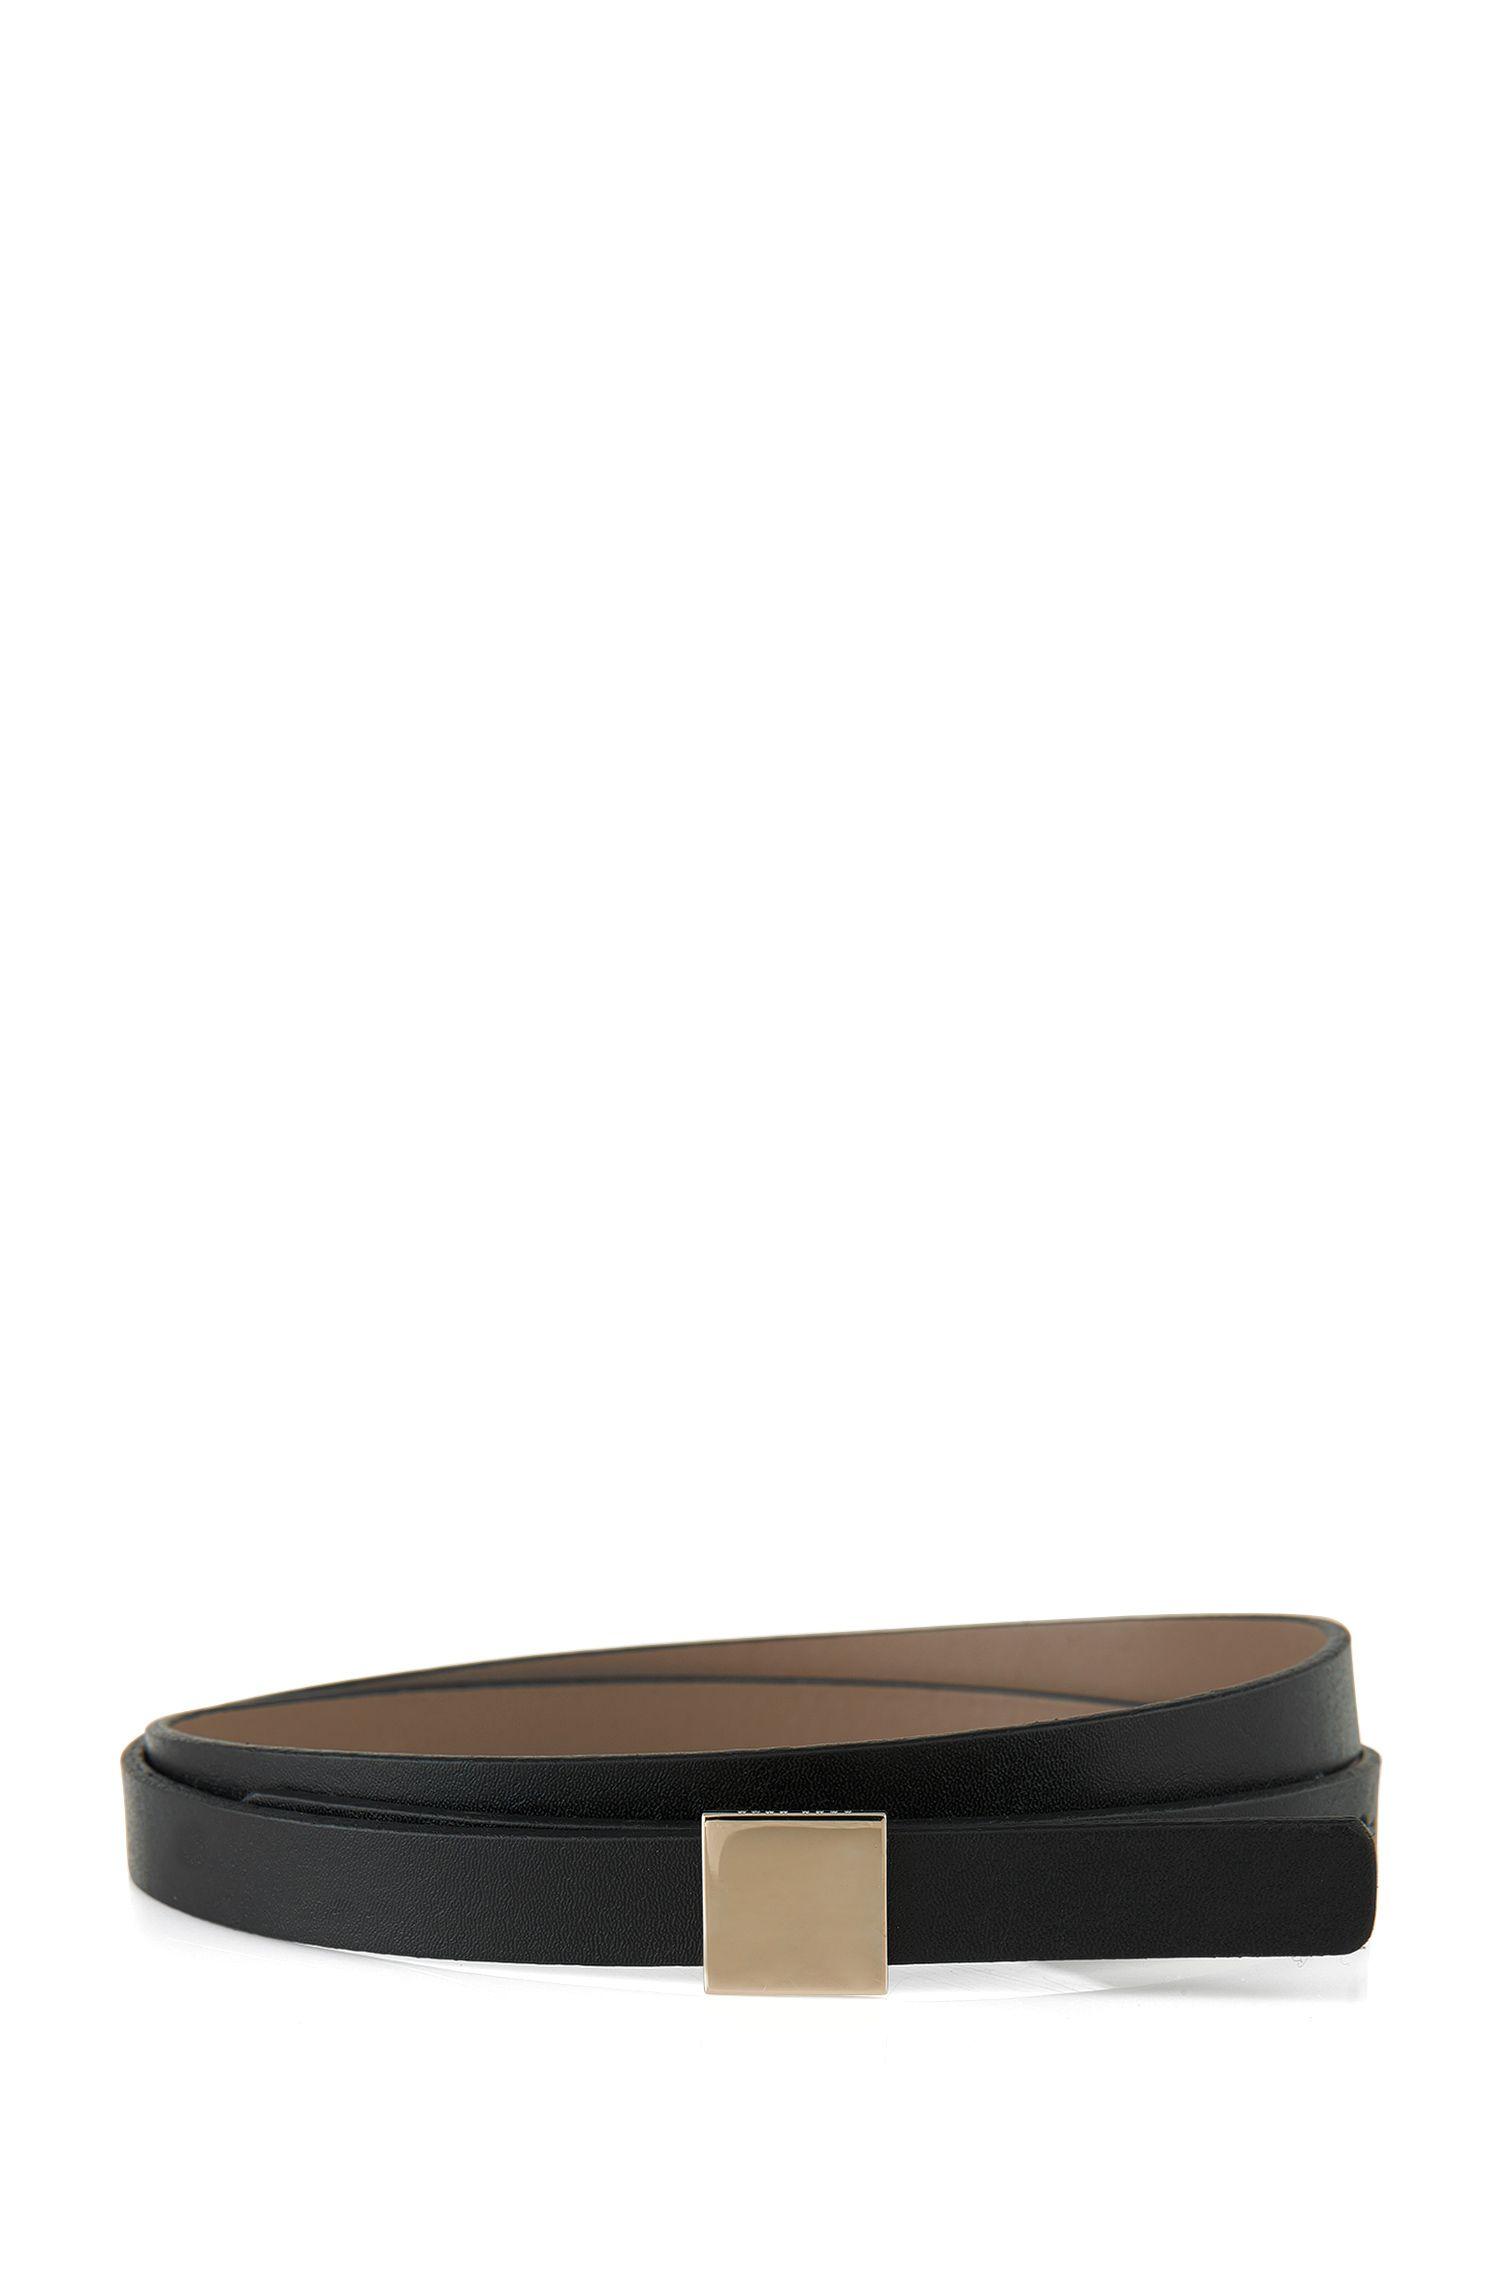 'Bliss'   Leather Reversible Plaque Skinny Belt